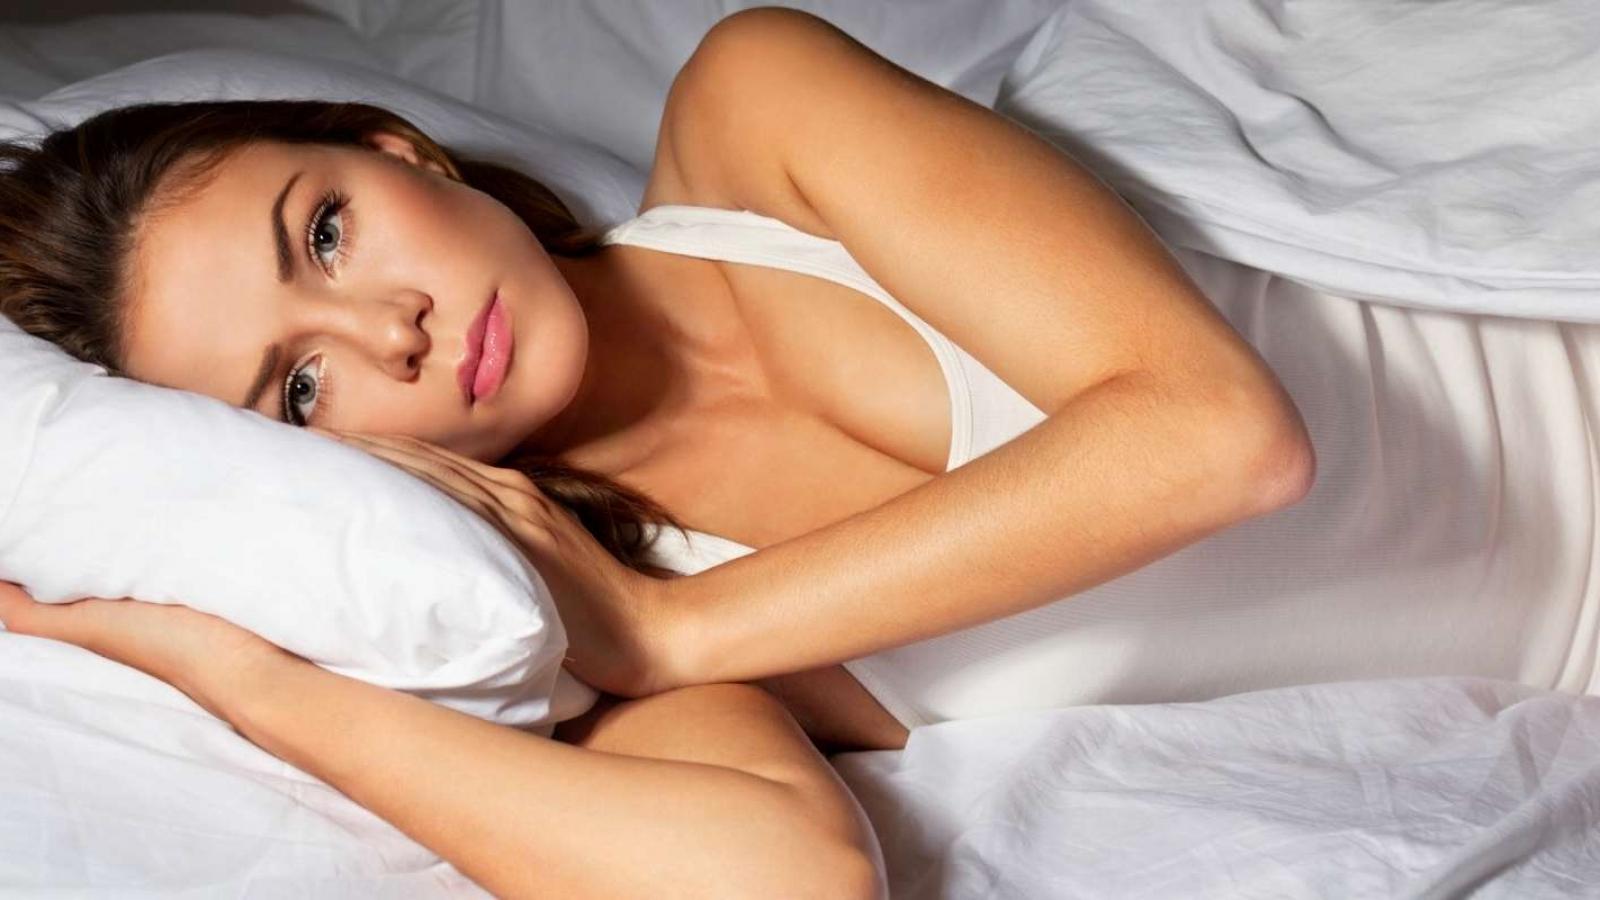 weighted-blanket-help-sleep